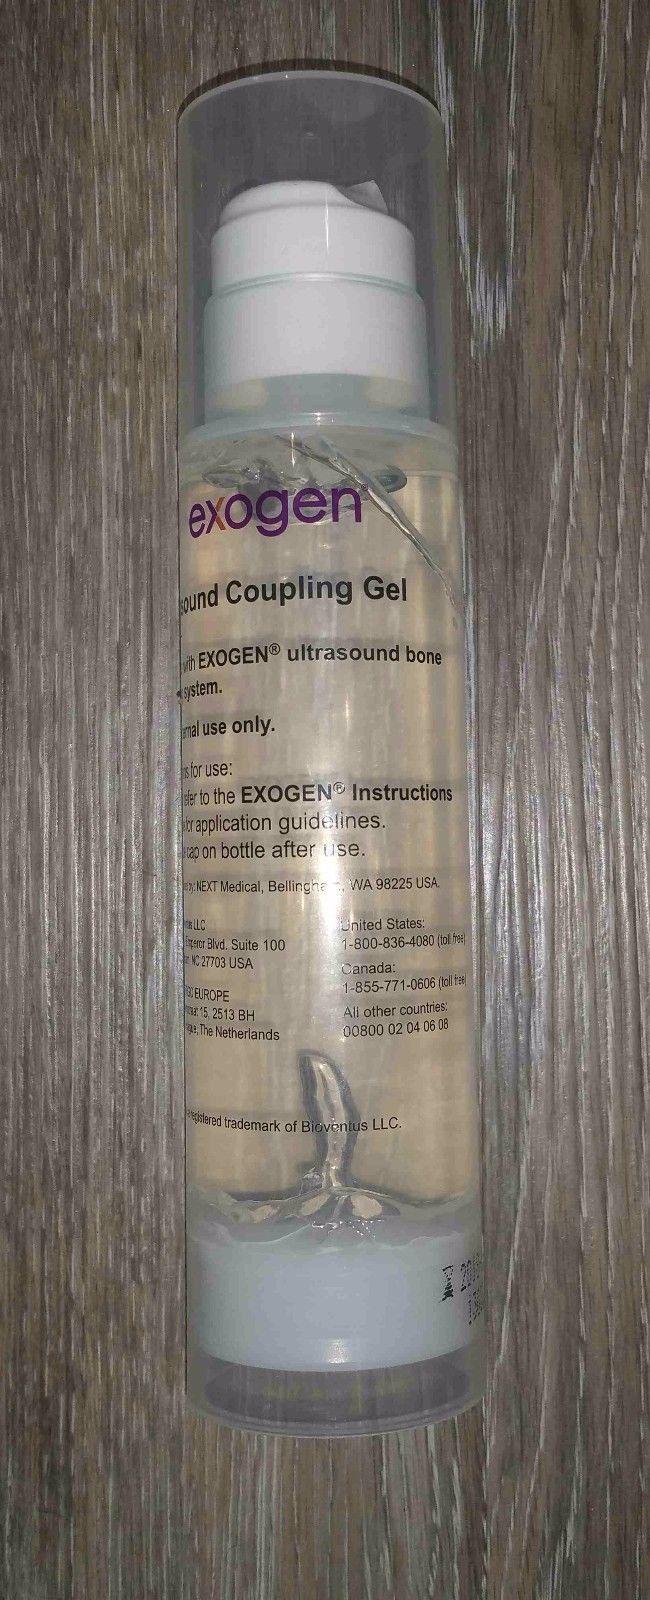 Exogen Ultrasound Bone Healing System Coupling Gel 200